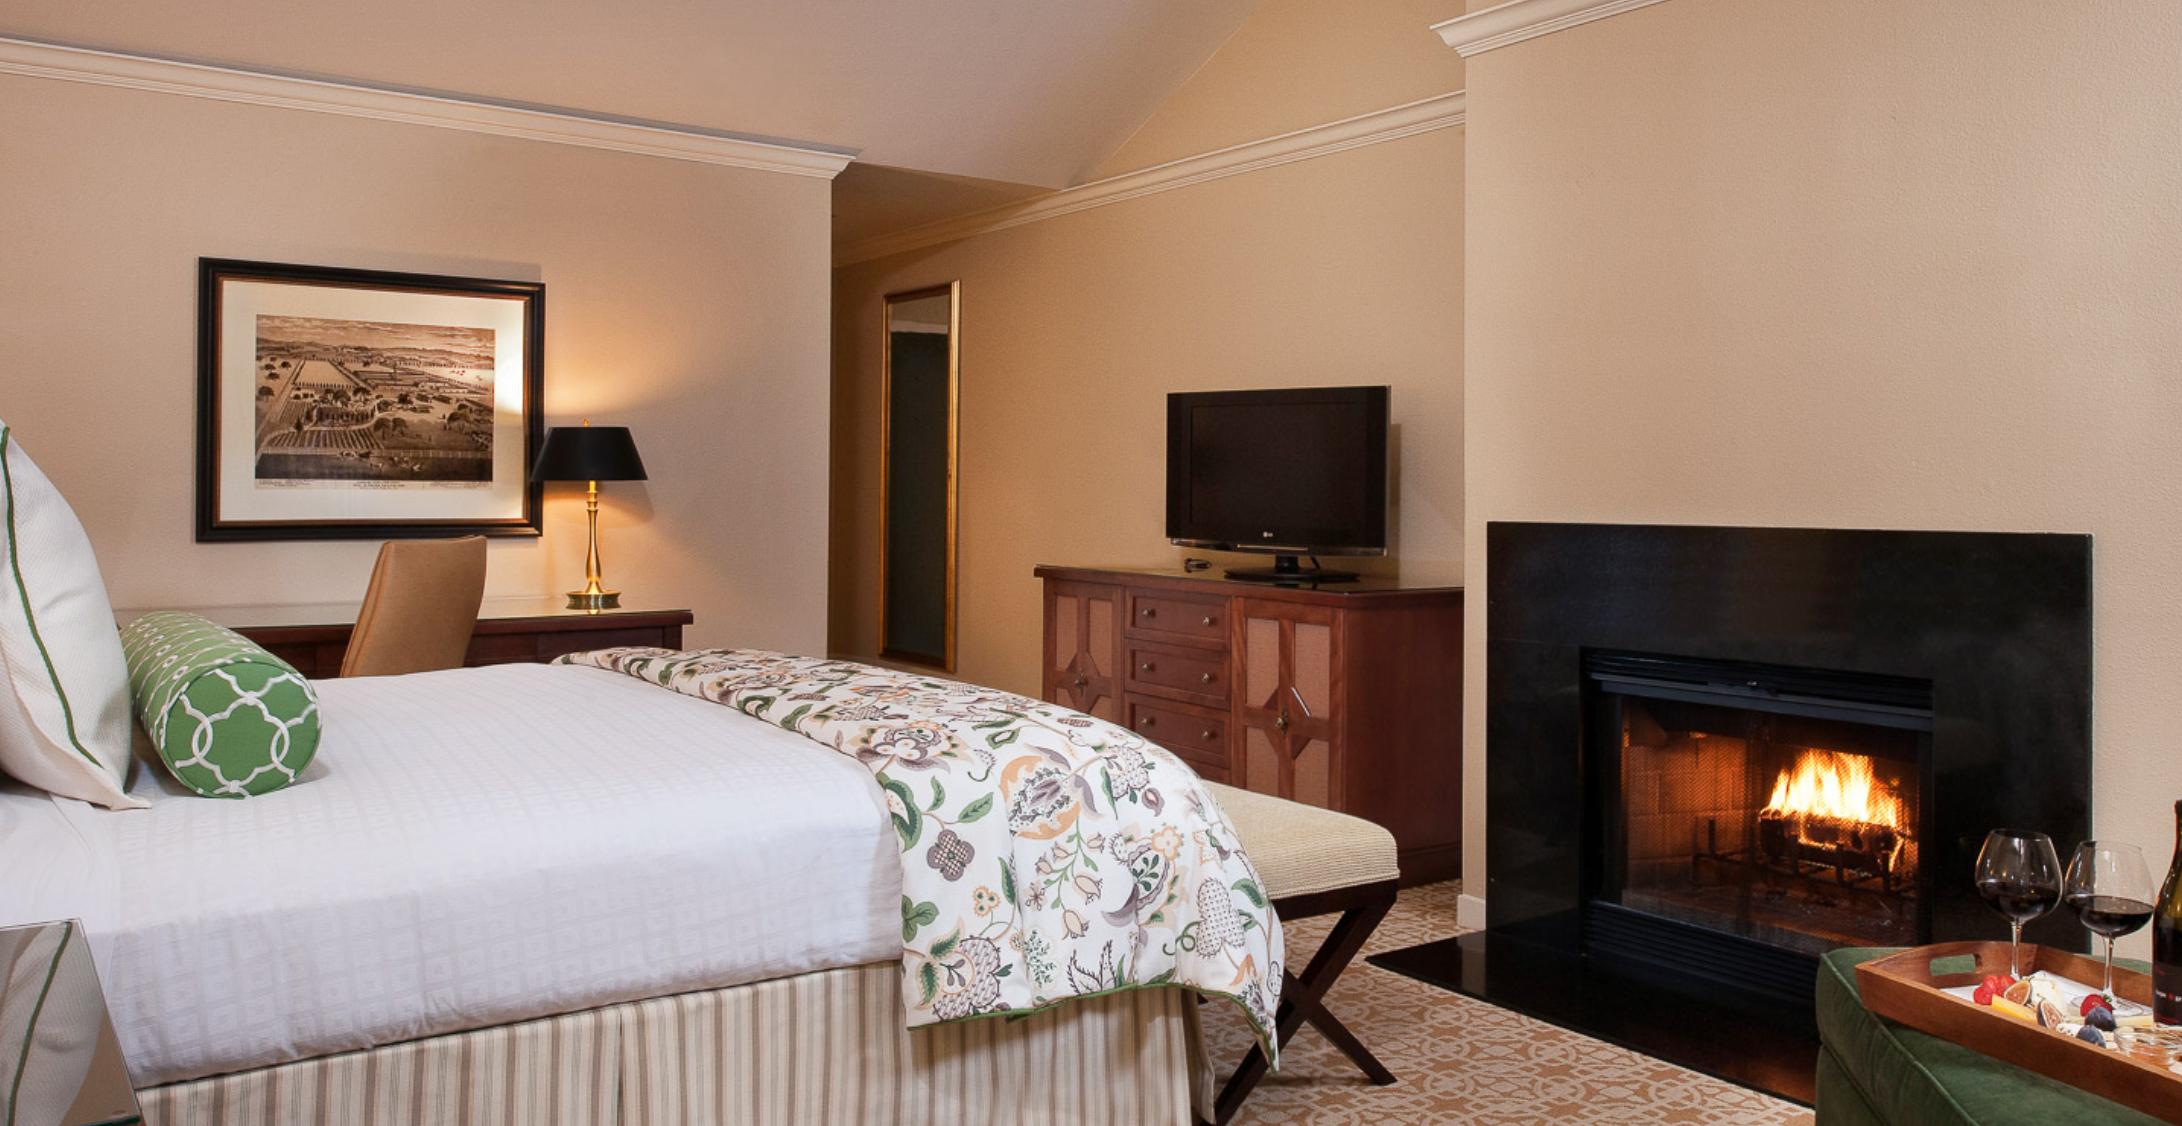 https://www.hotelsbyday.com/_data/default-hotel_image/4/22208/screenshot-2020-10-05-at-7-07-52-pm.png